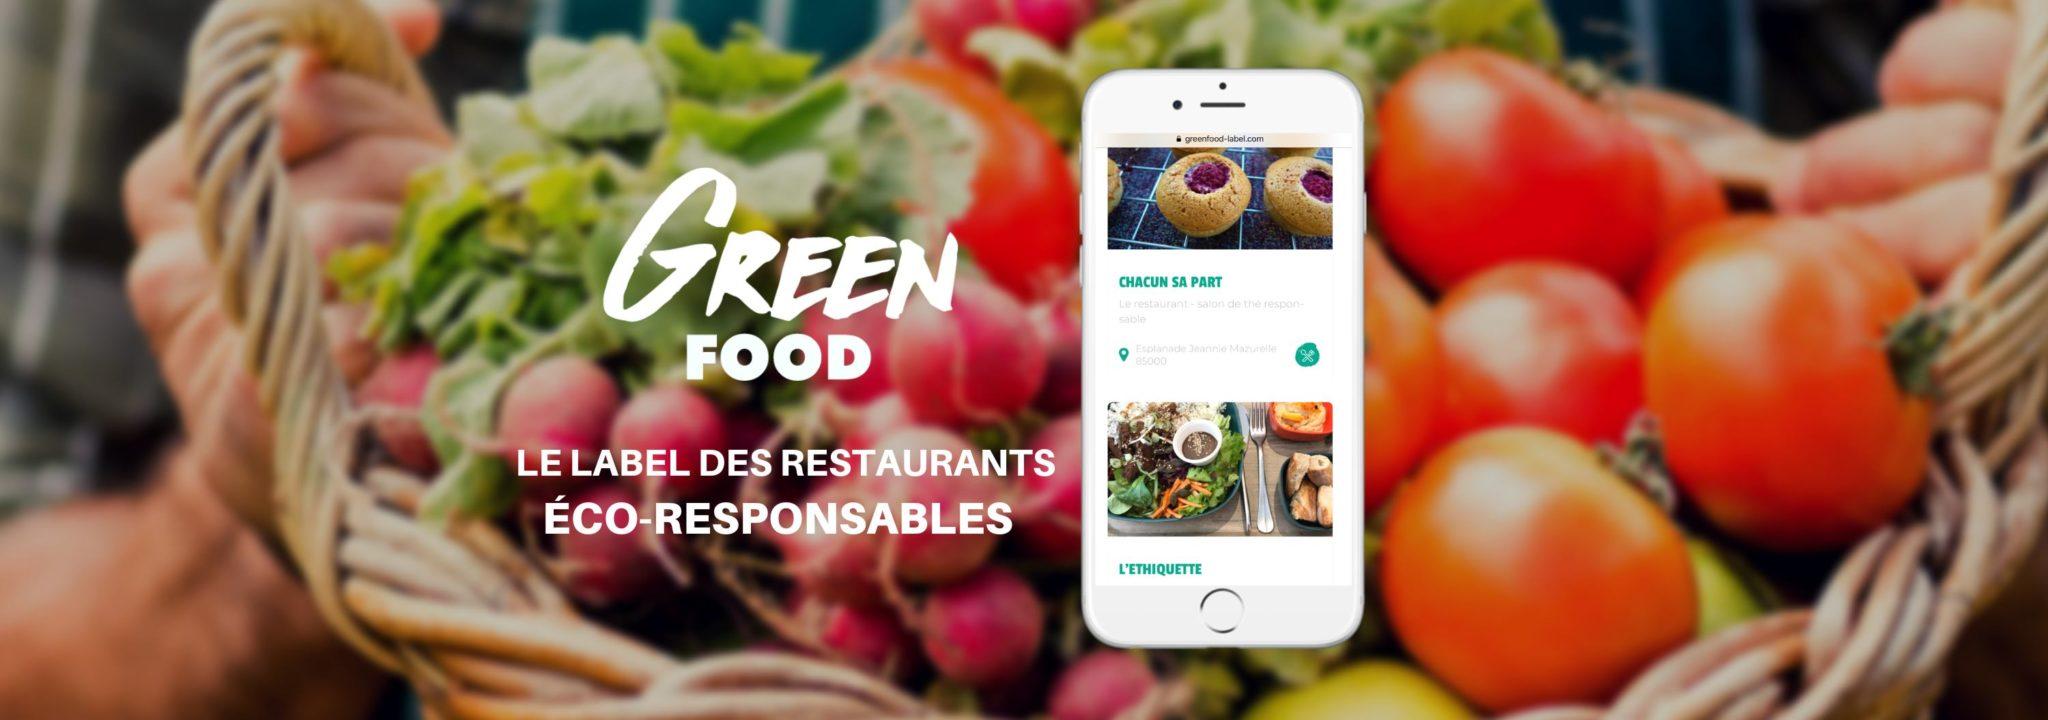 Green Food Label